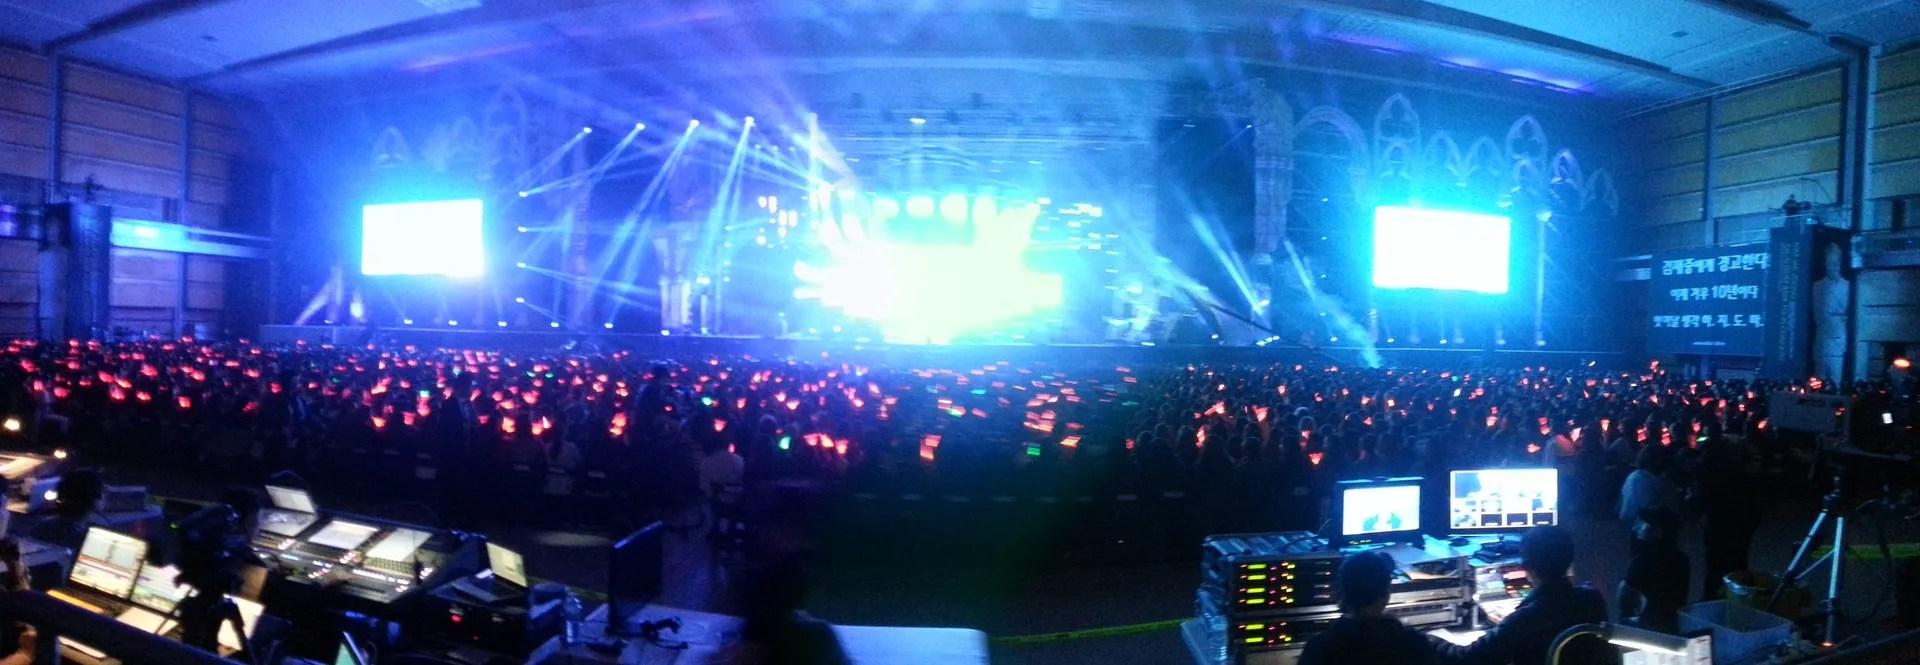 photo concertking_2361266727276256518.jpg